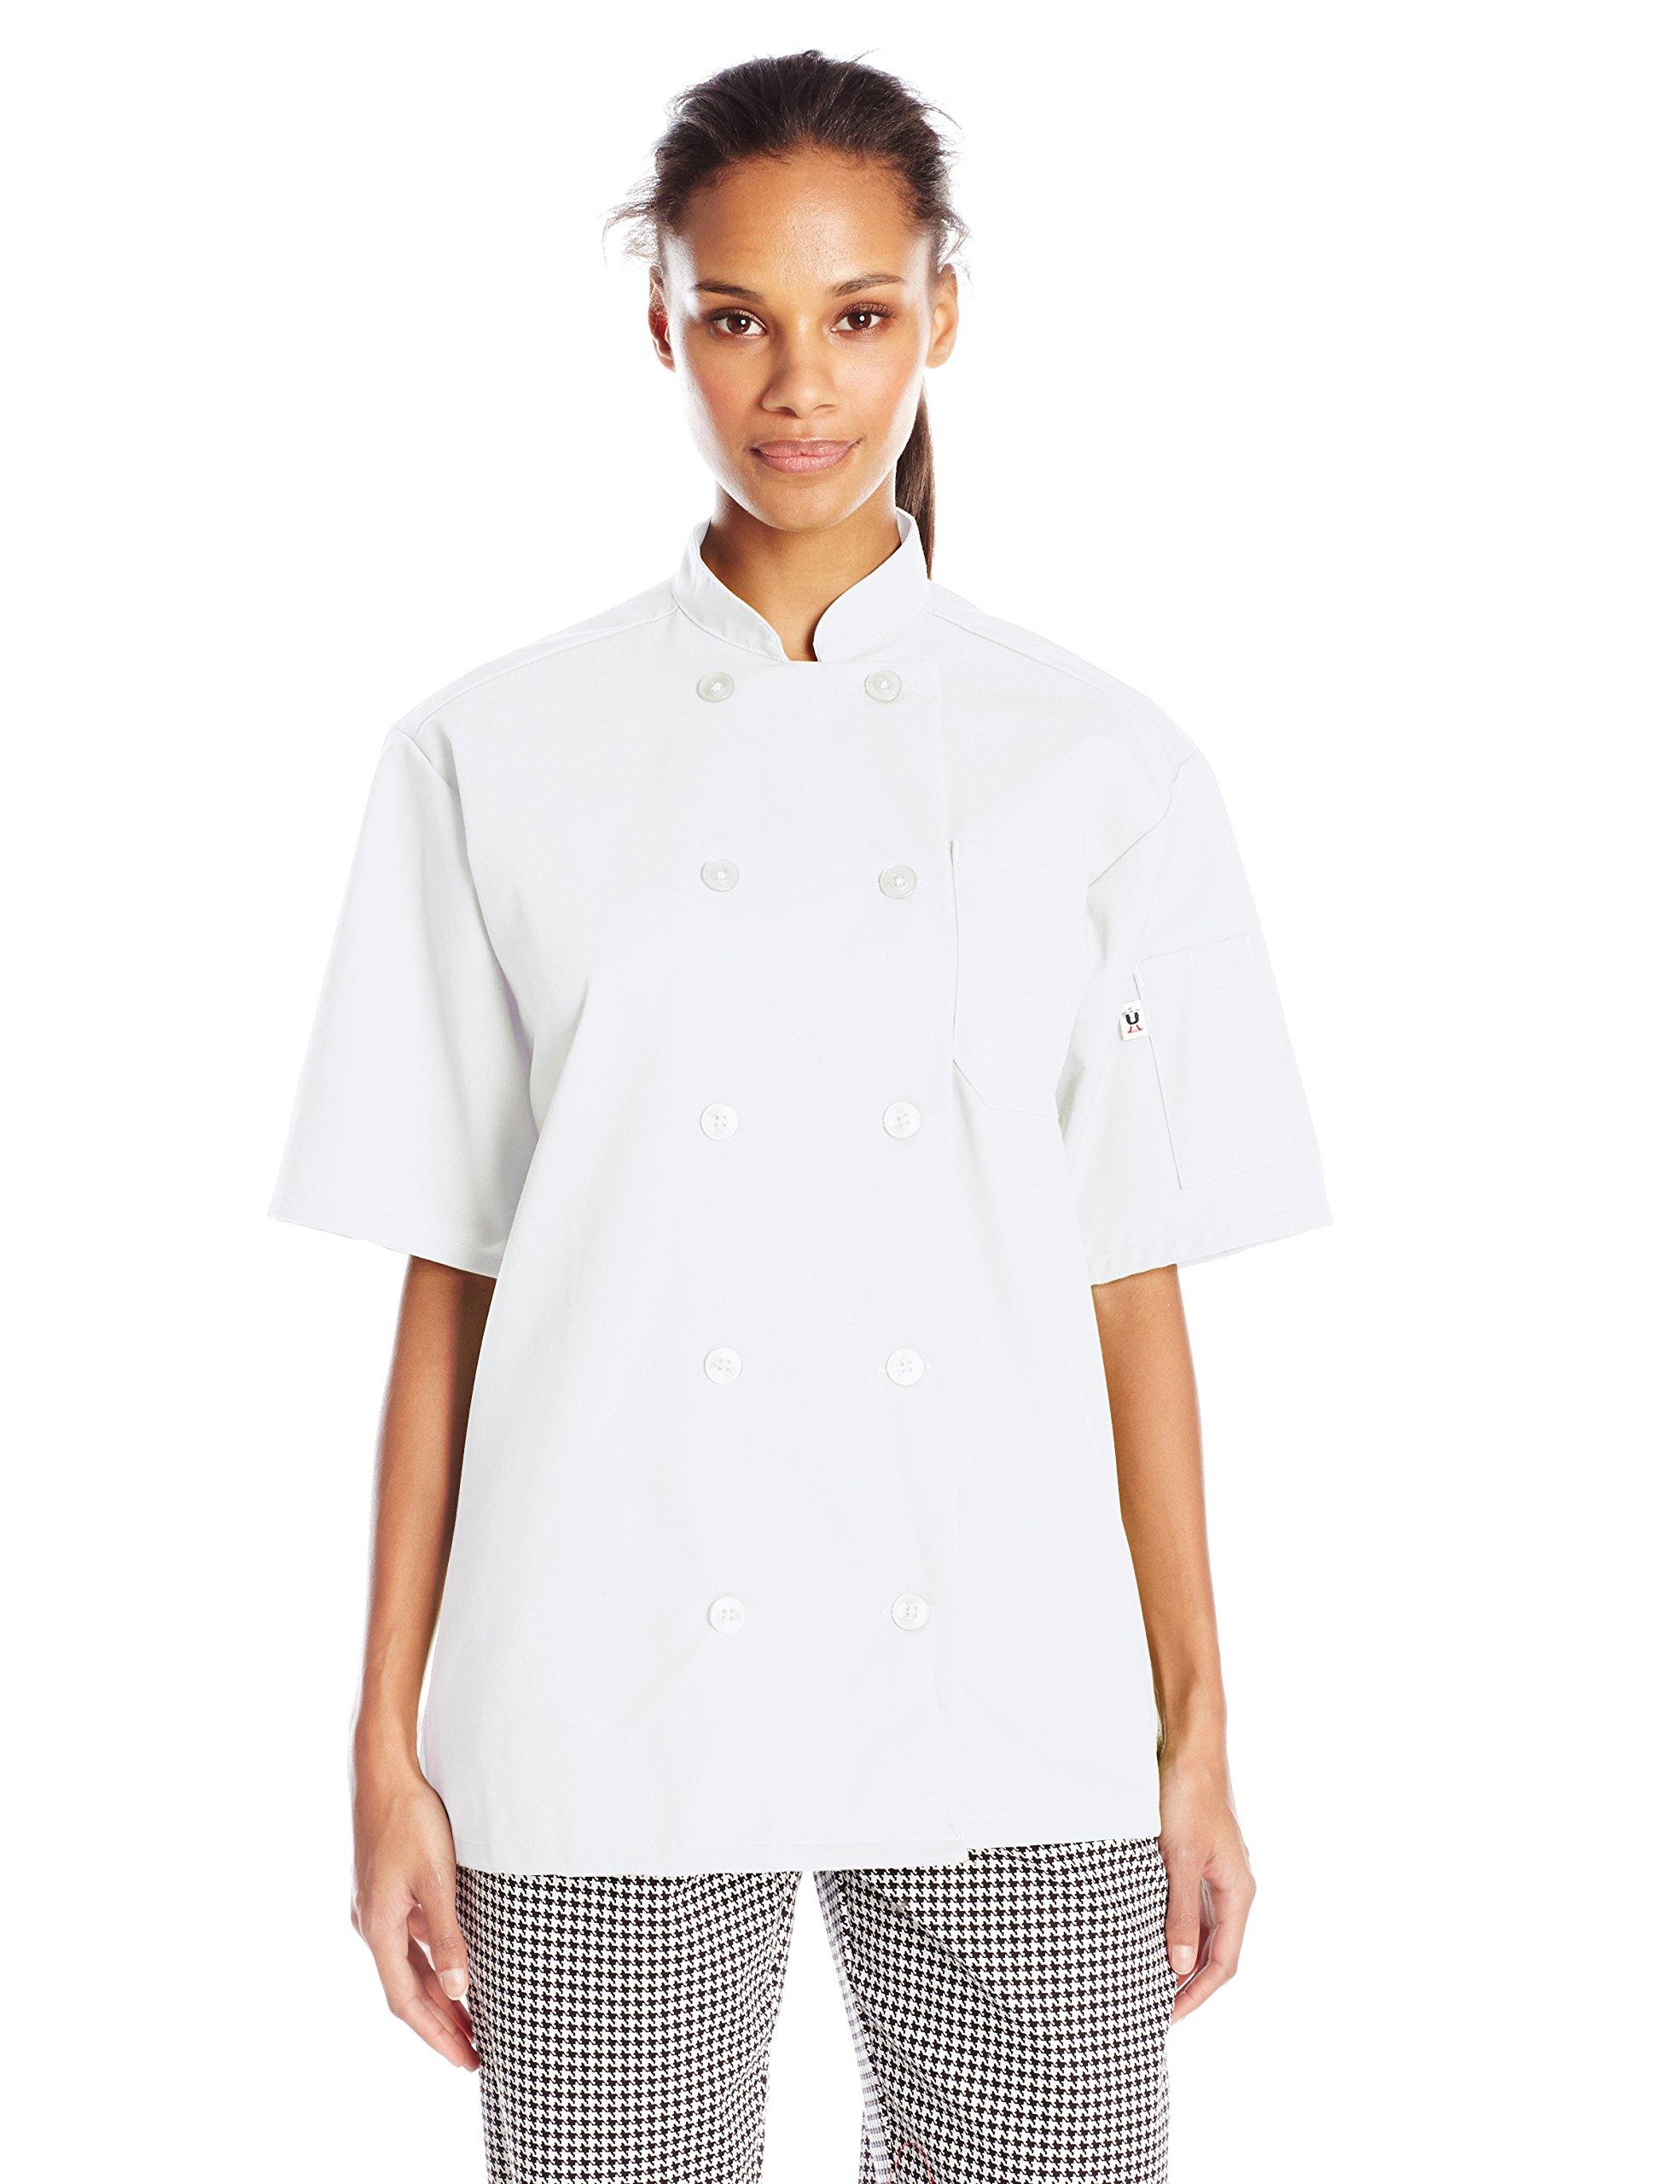 Uncommon Threads Unisex South Beach Chef Coat Short Sleeves, White, Medium